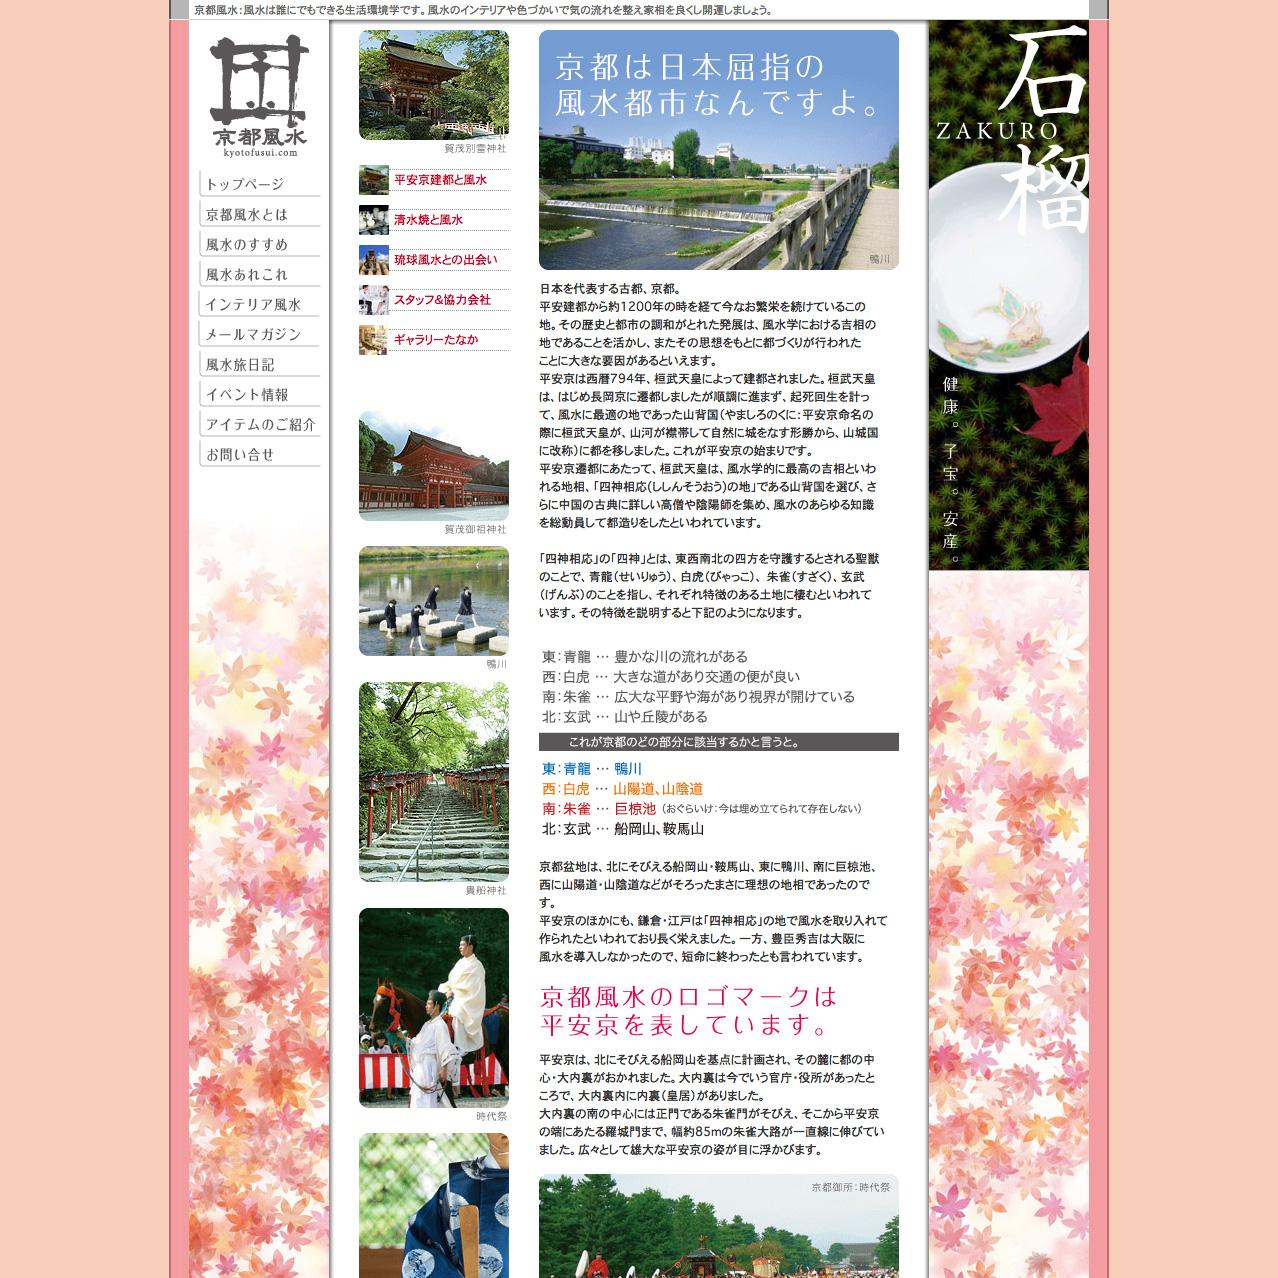 京都風水 平安京建都と風水